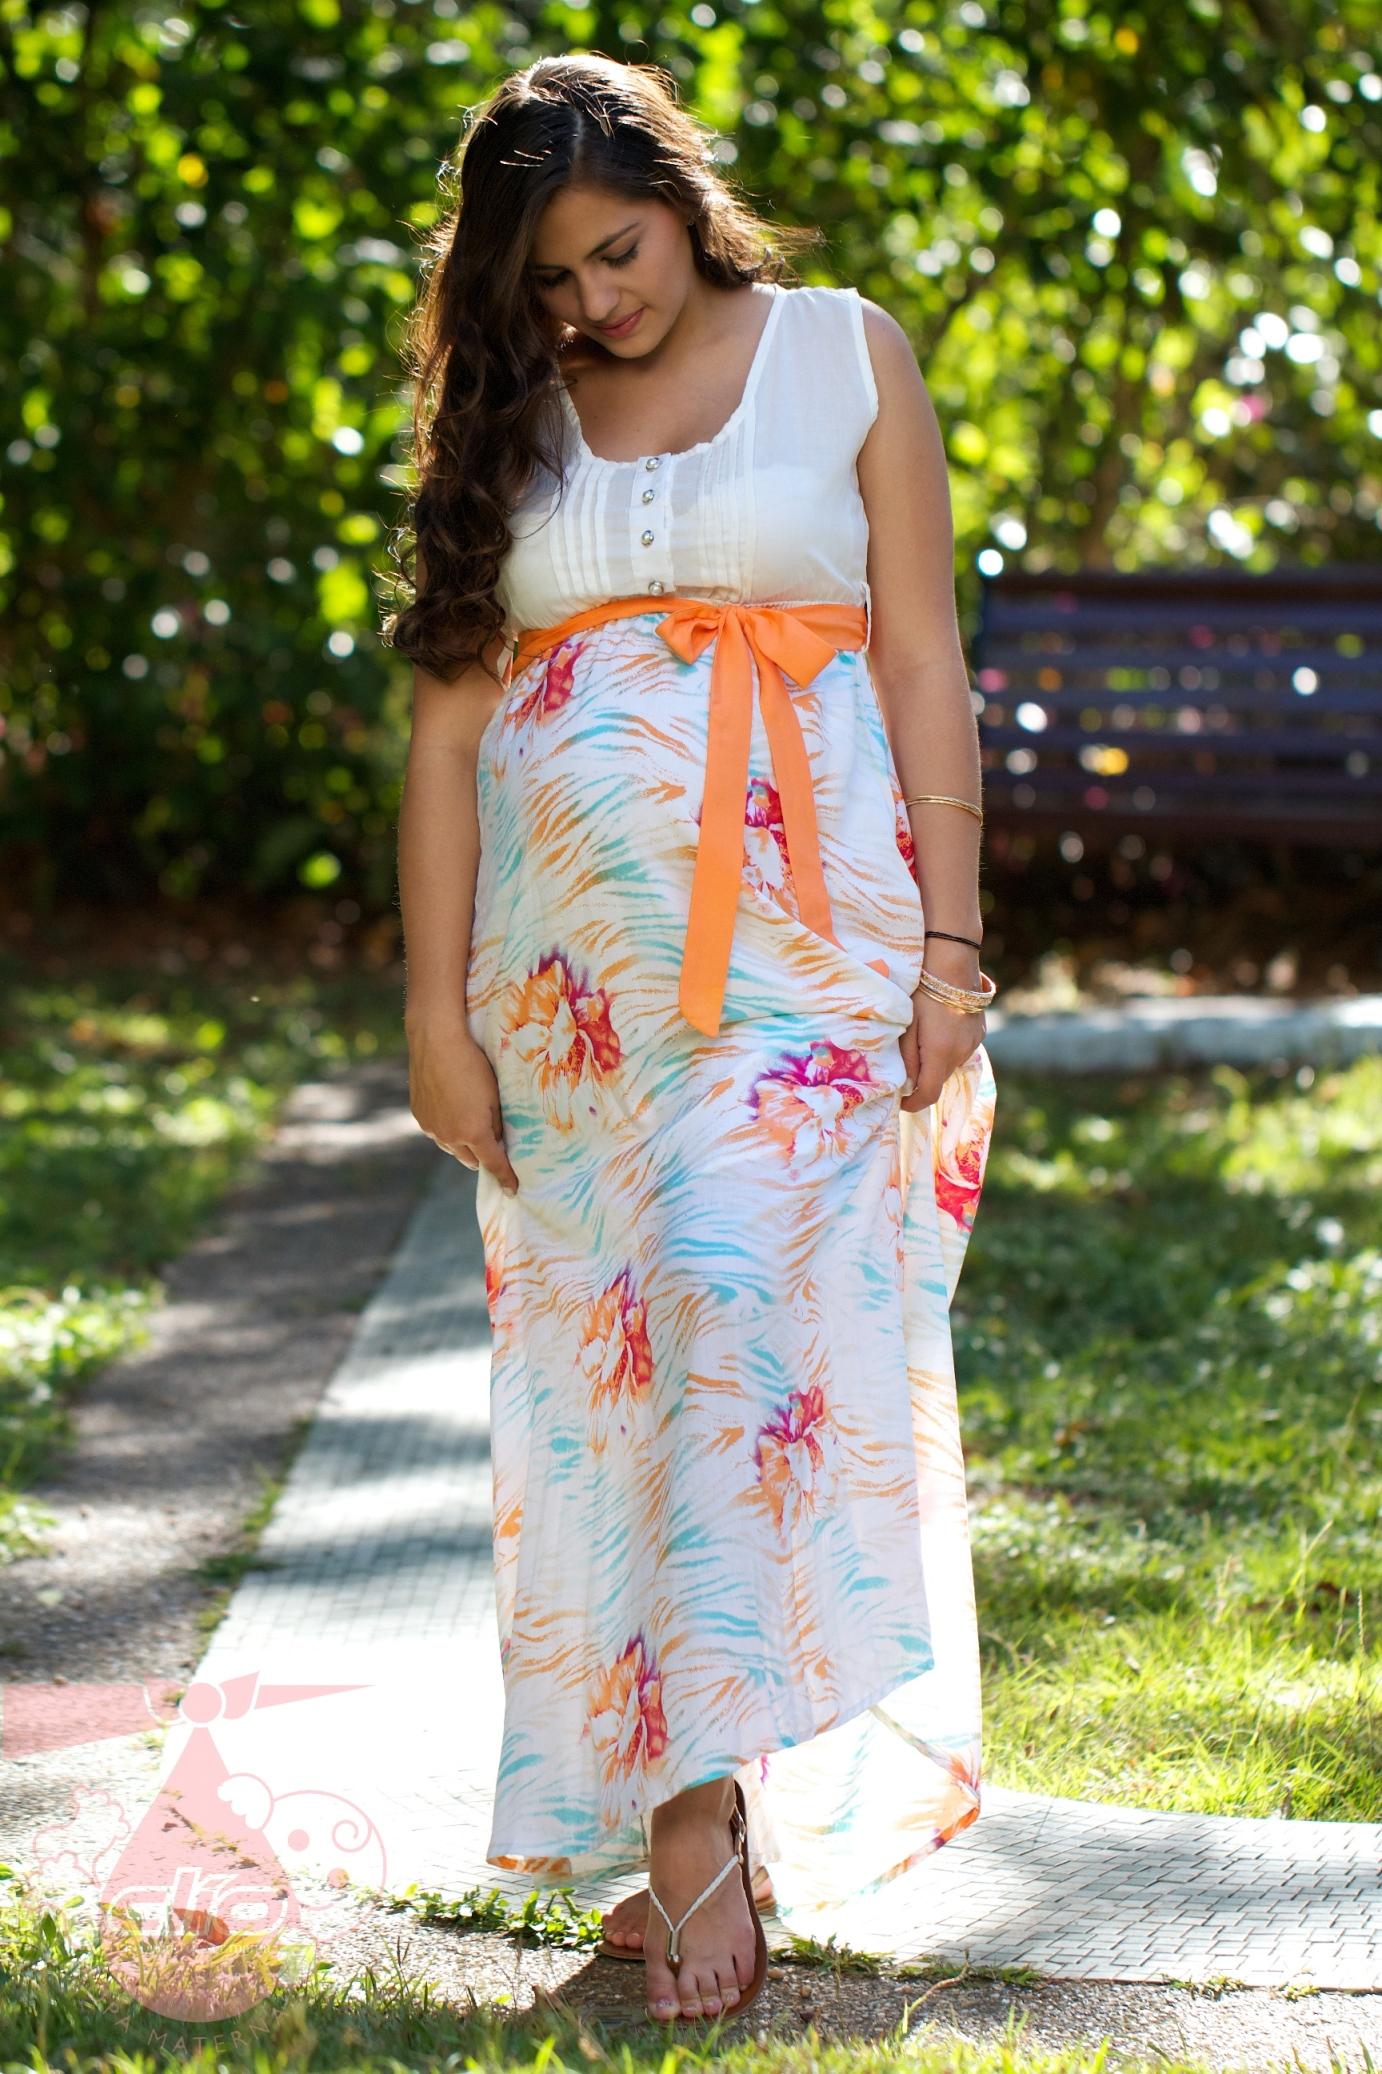 بالصور فساتين للحوامل , اجمل الفساتين المريحة للحوامل 1512 3